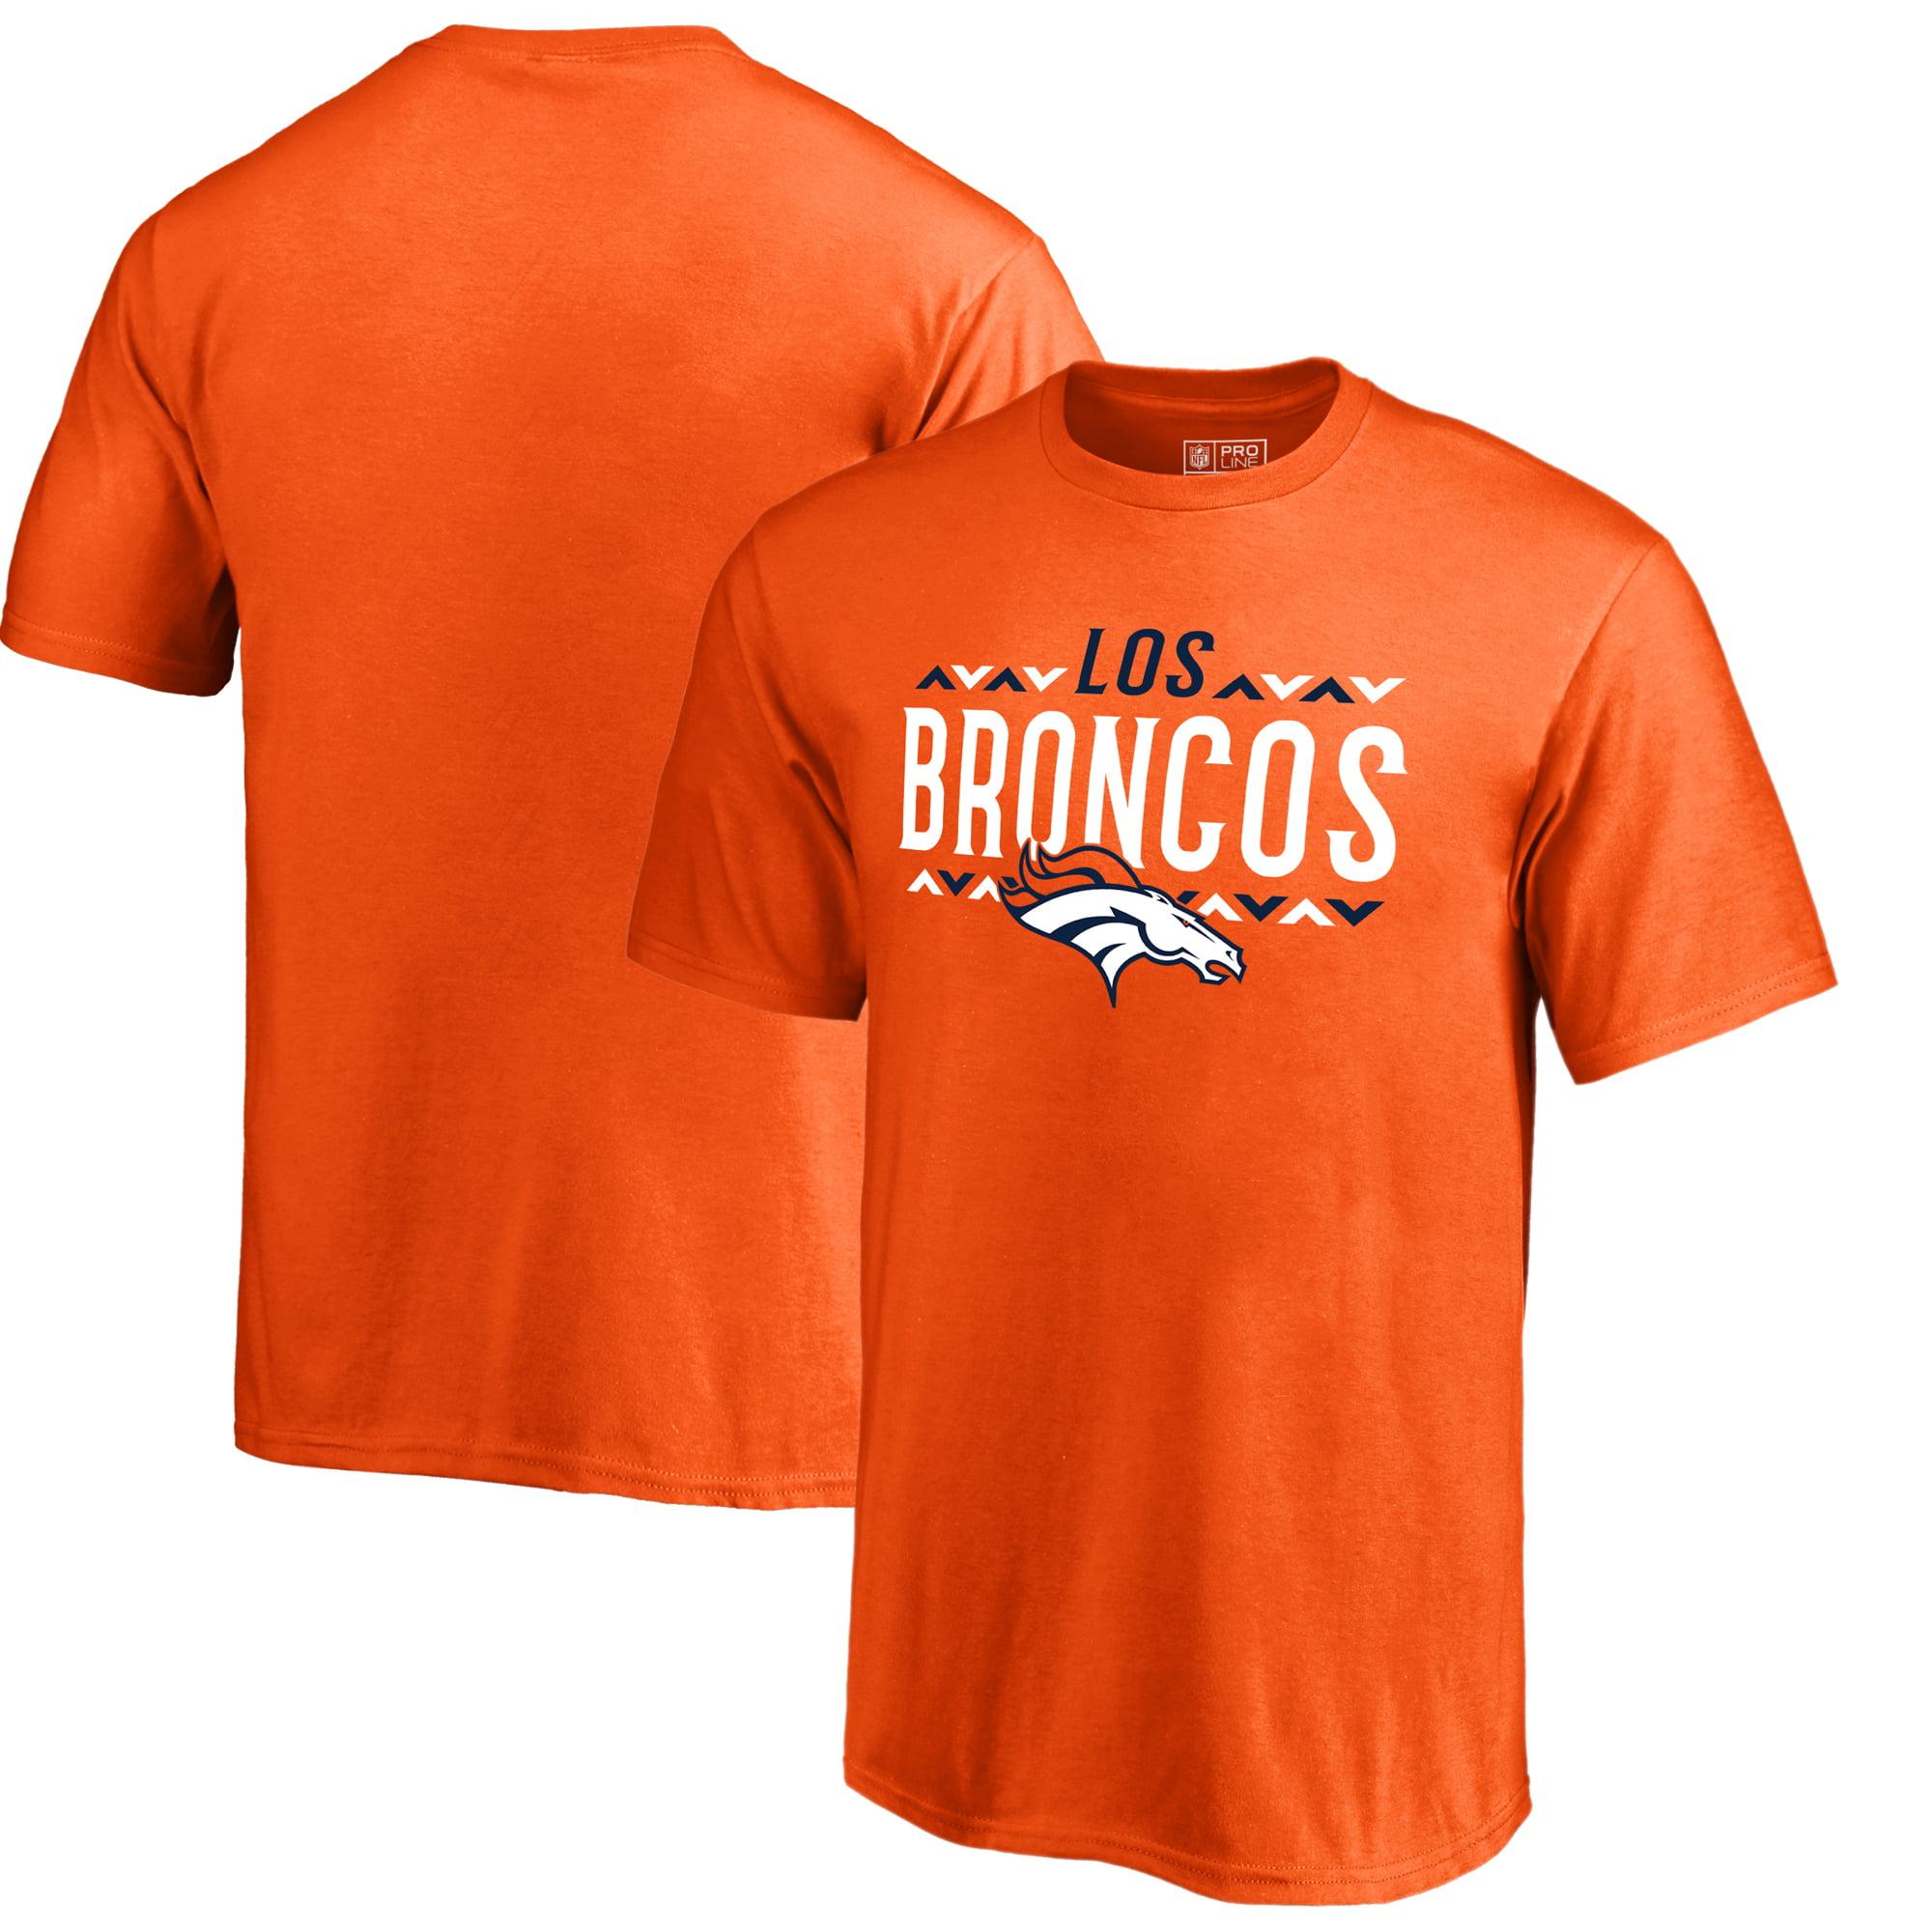 Denver Broncos NFL Pro Line by Fanatics Branded Youth Arriba T-Shirt - Orange